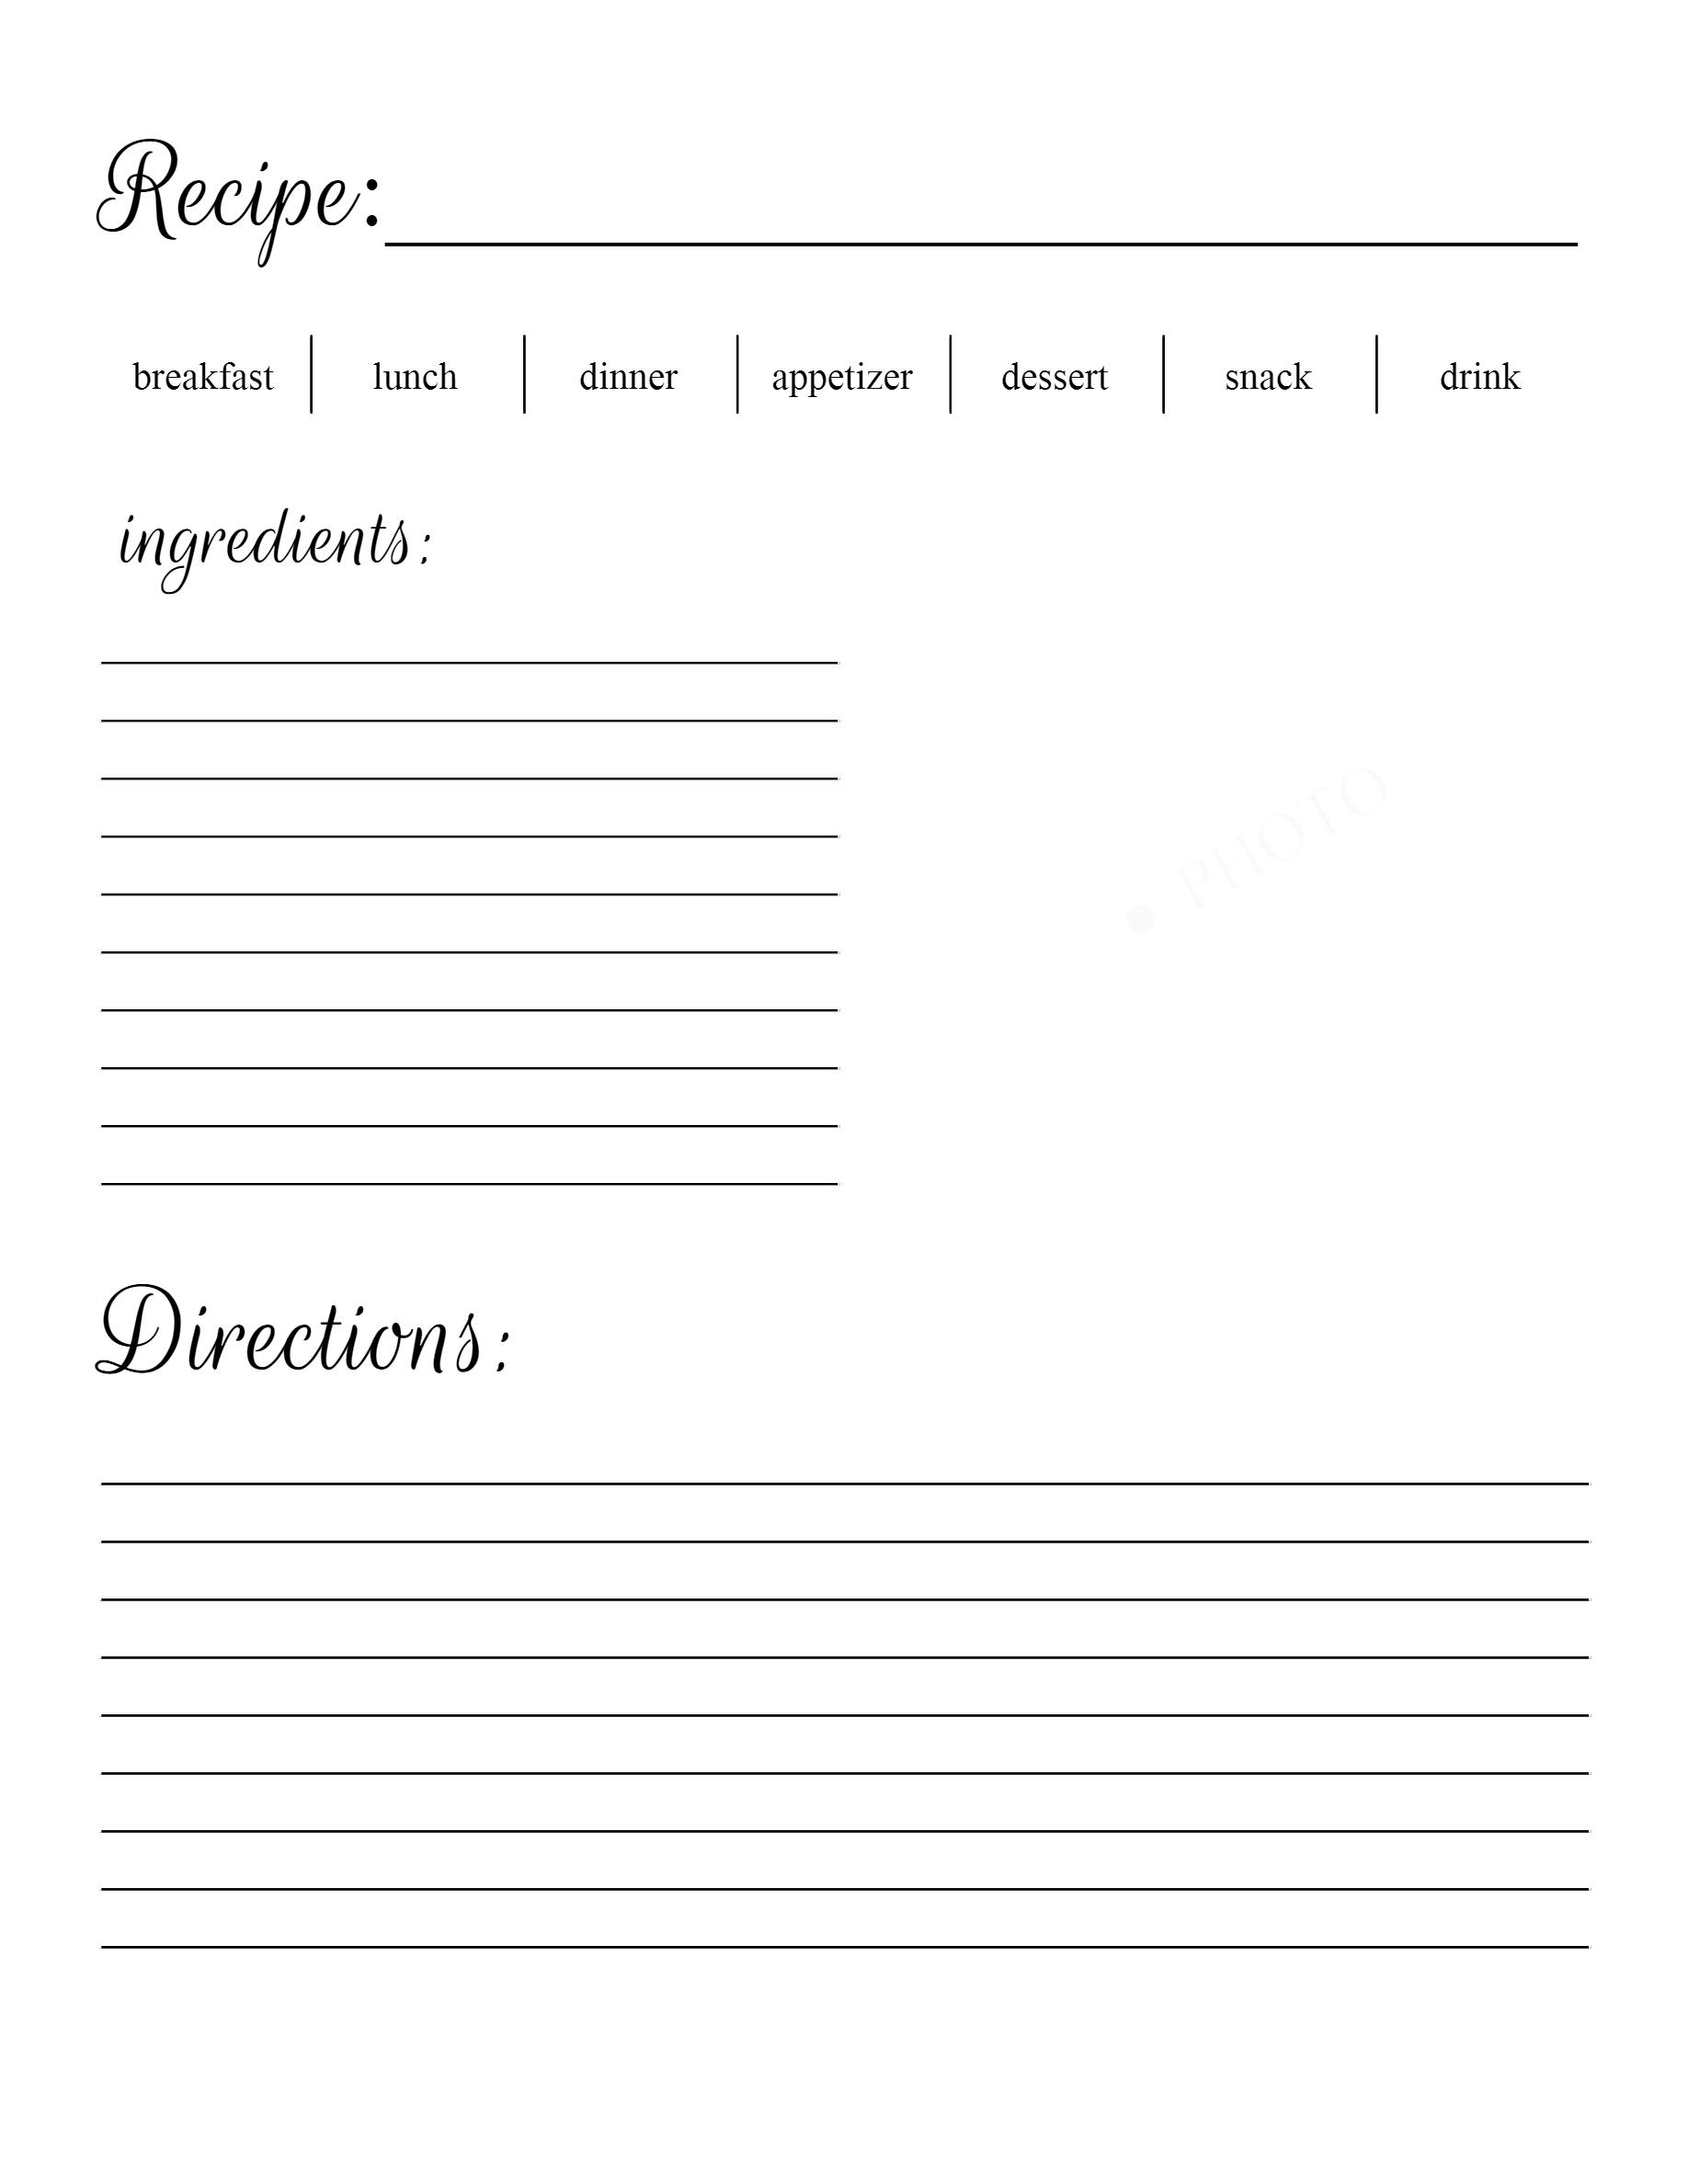 Recipe Free Printable